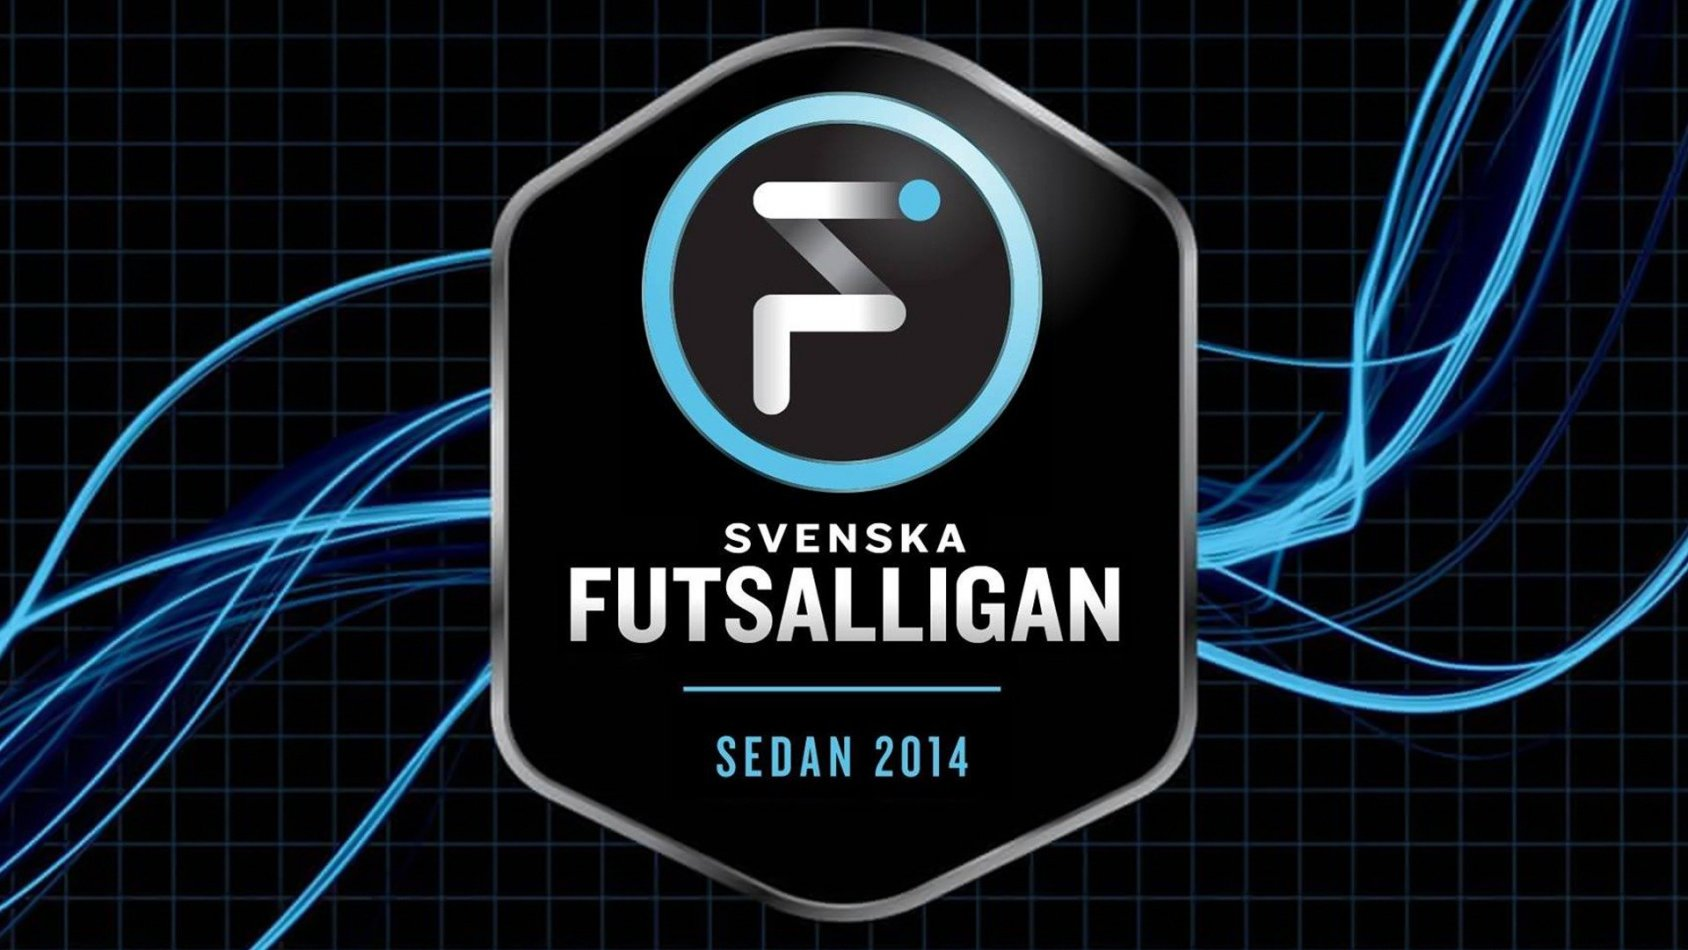 Svenska Futsalligan